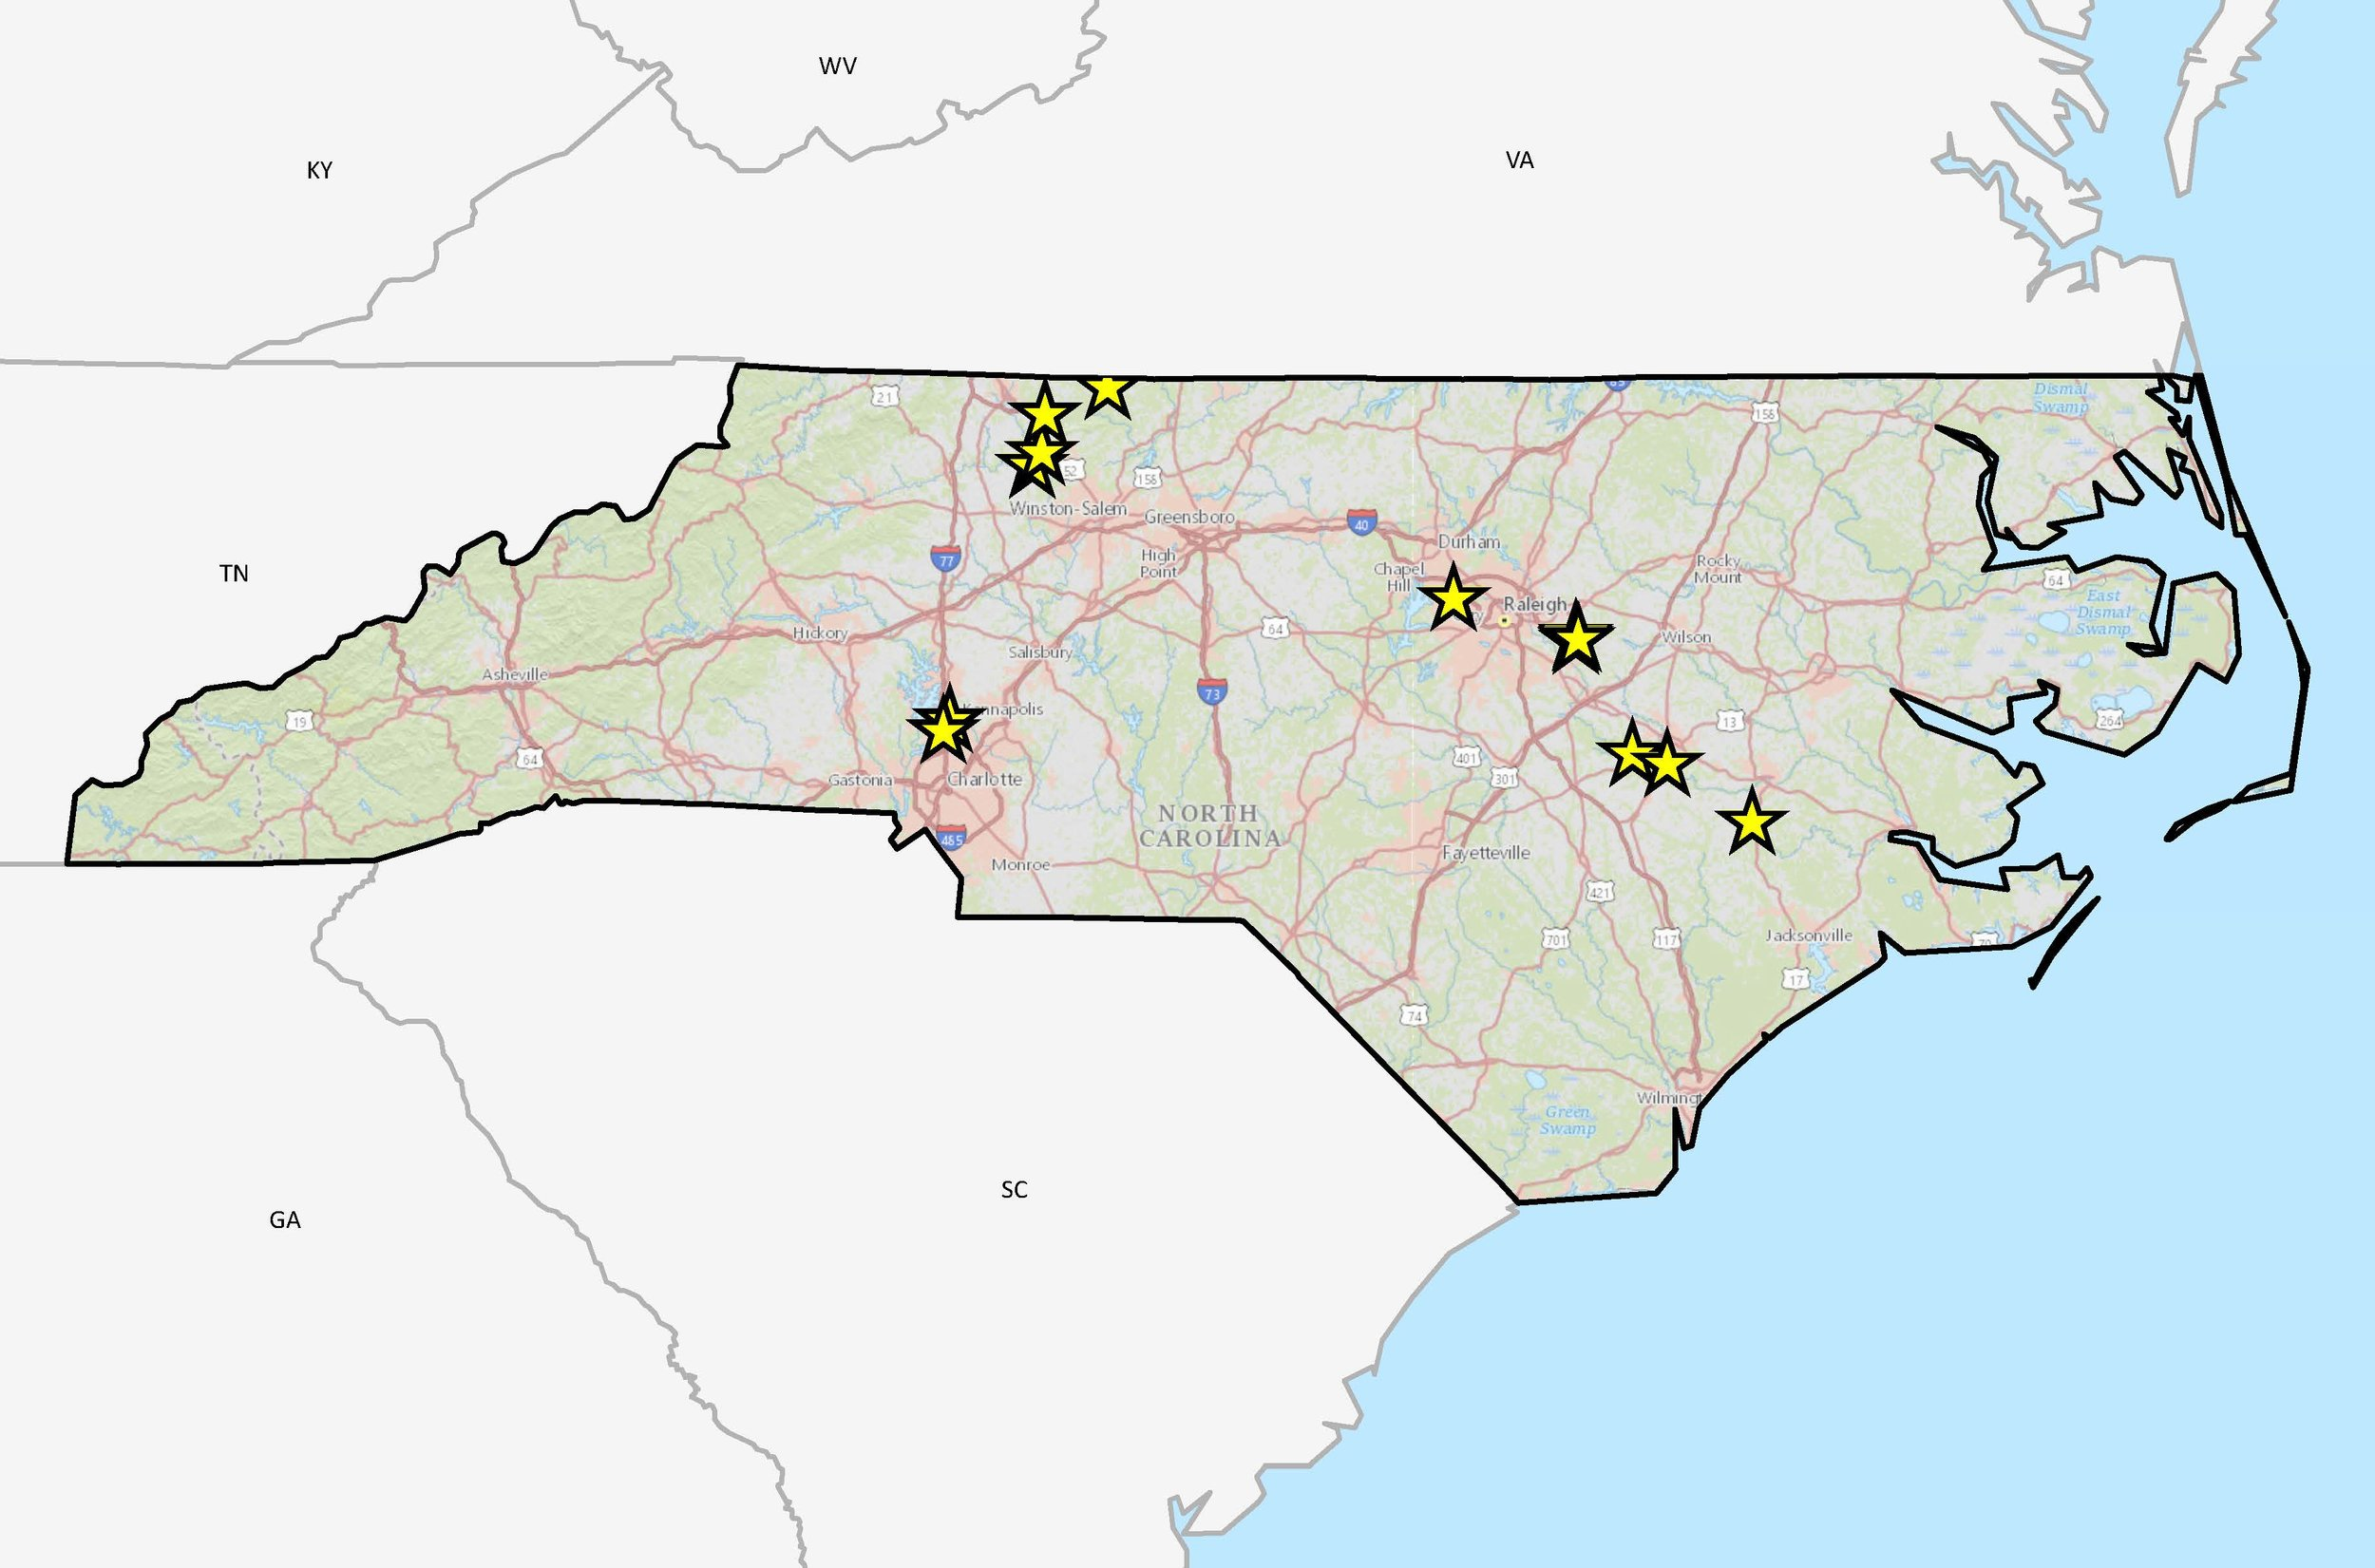 North Carolina Projects